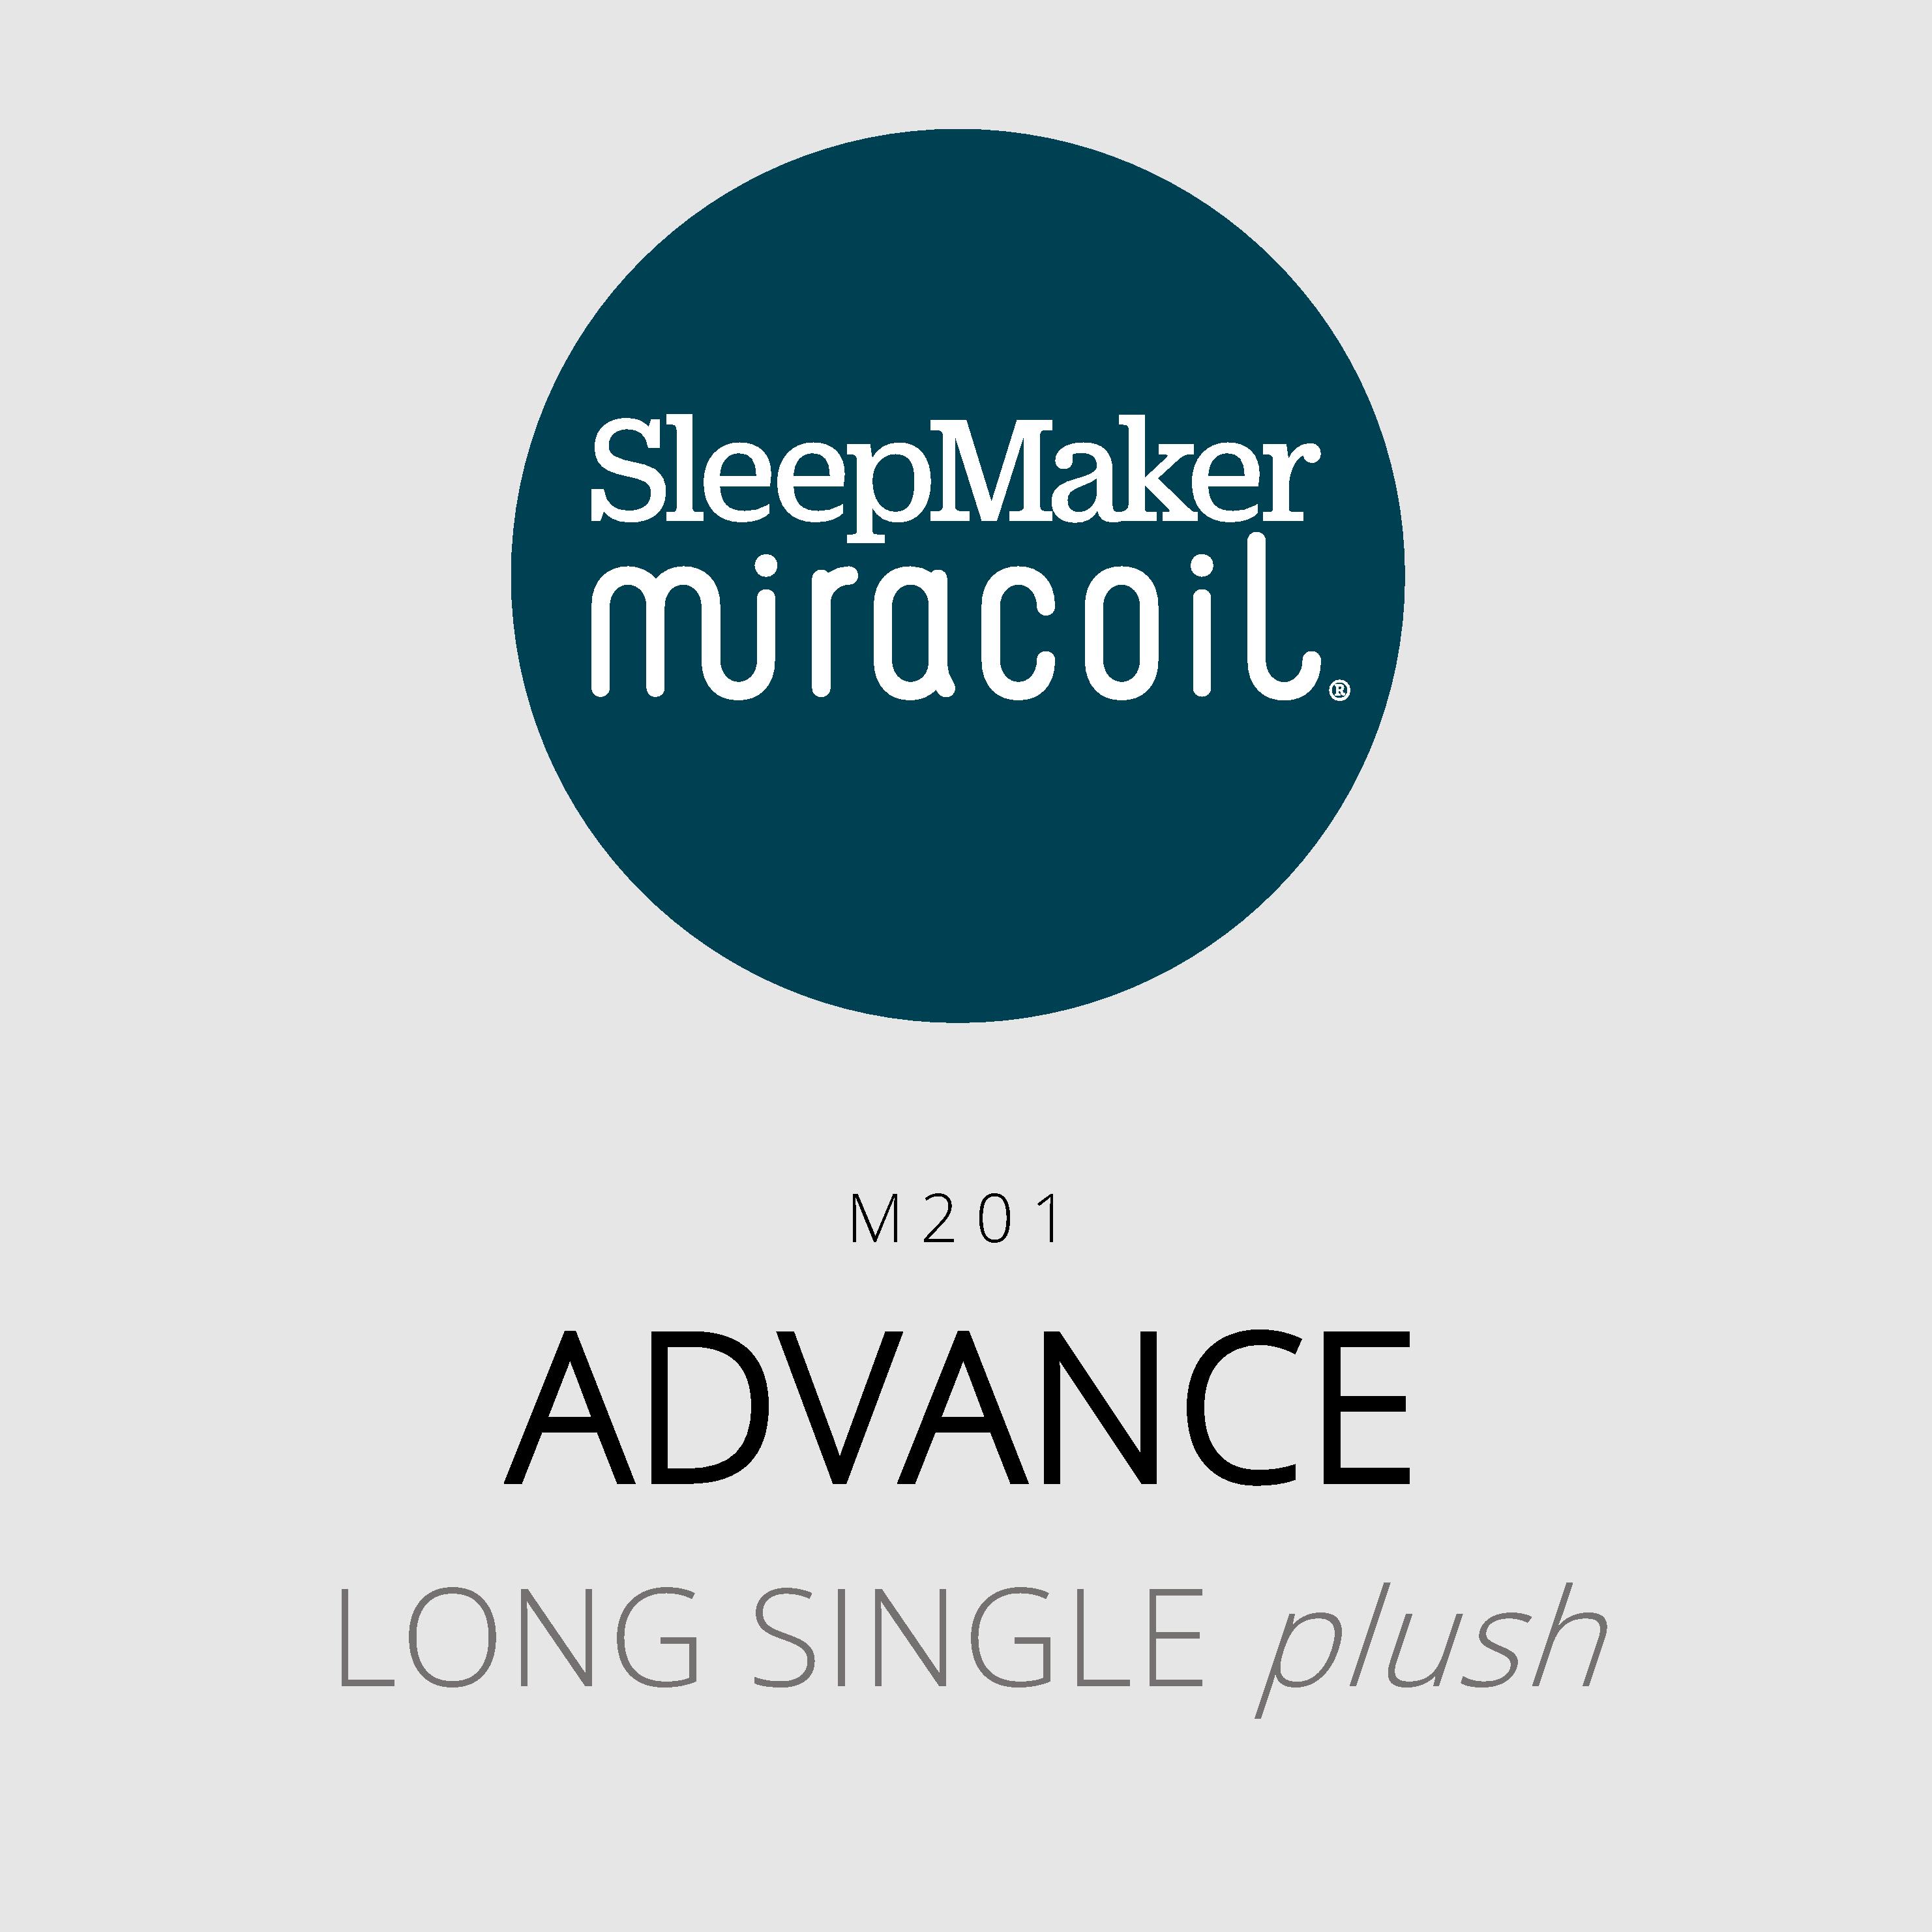 SleepMaker Miracoil – Advance – M201 – Long Single Plush Mattress